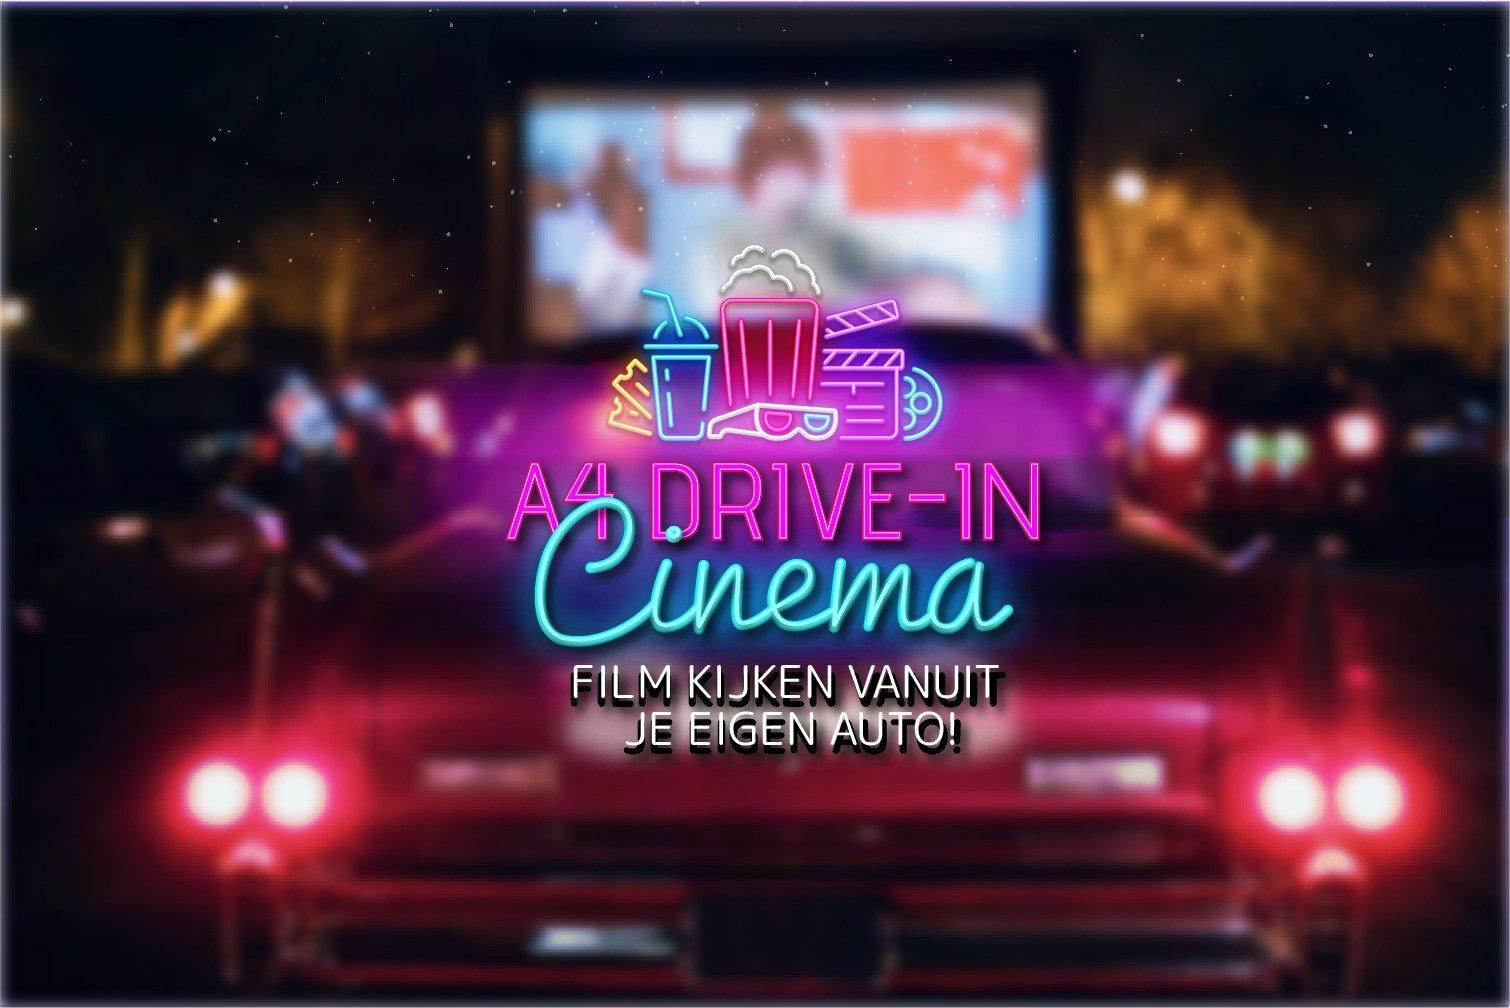 Drive-in bioscoop: Shutter Island